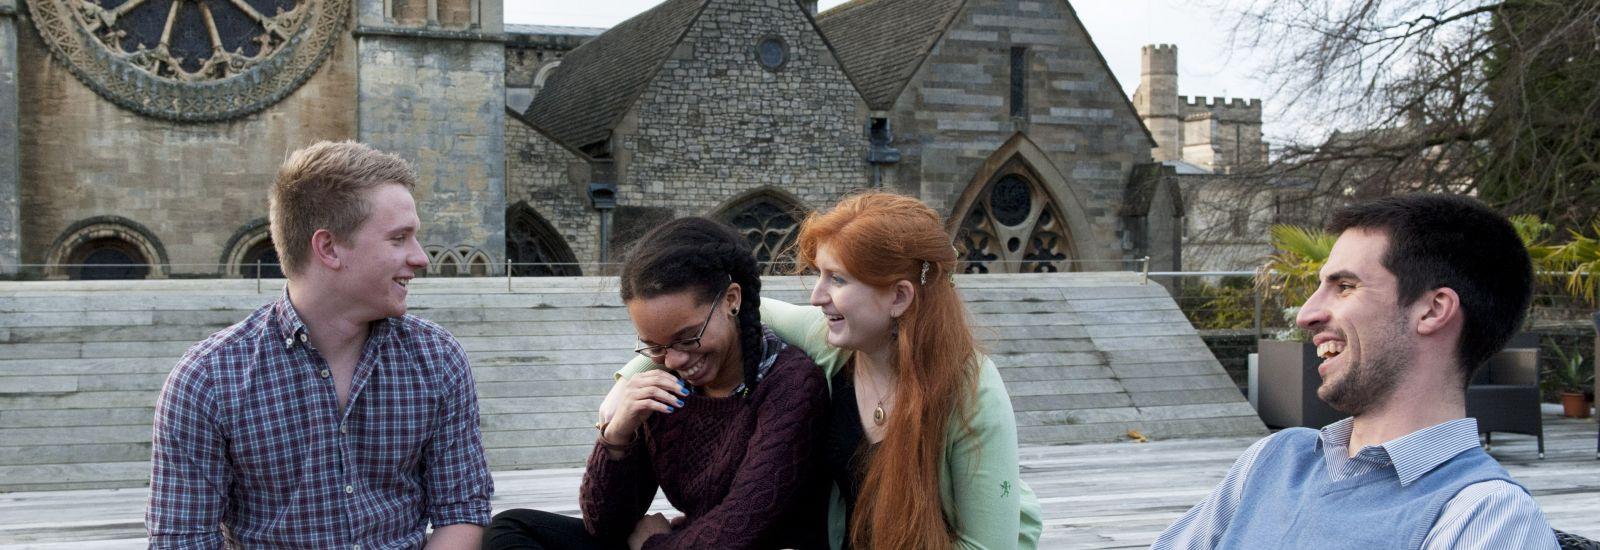 Oxford bursaries and scholarships